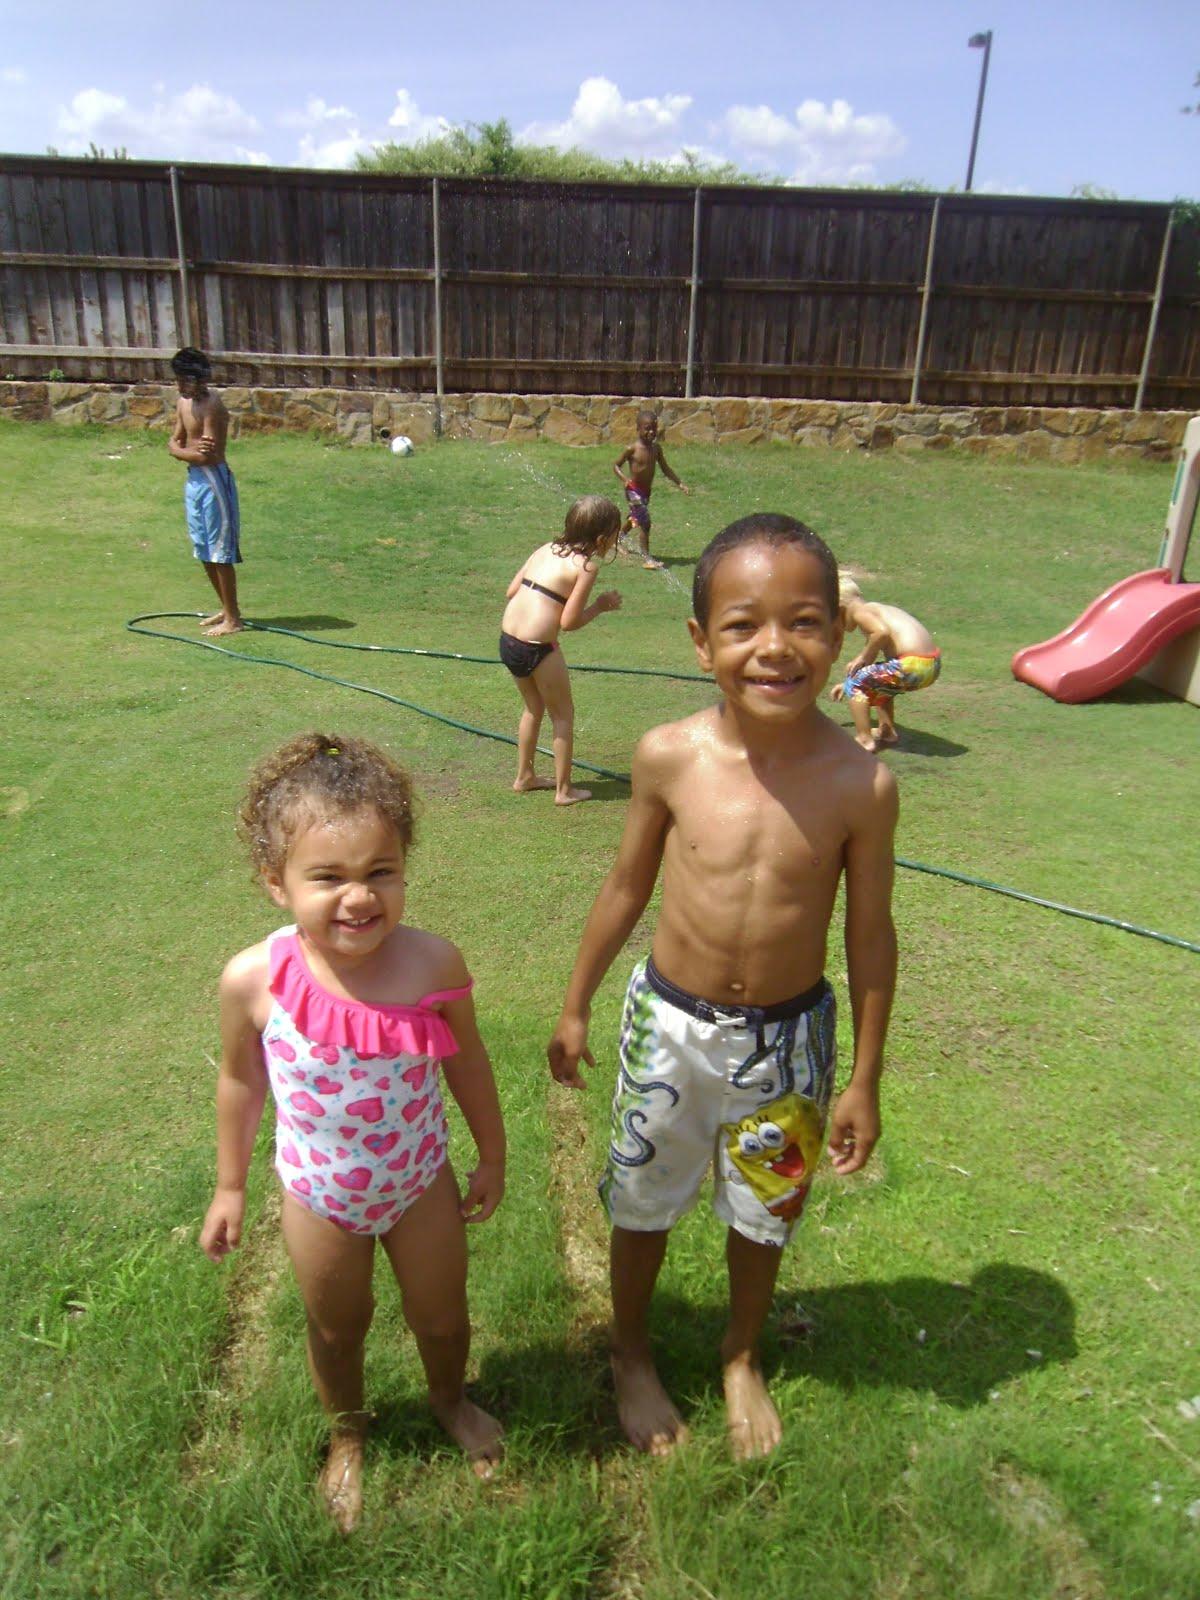 The Big Texas Hill Family: Big Boy Potty!